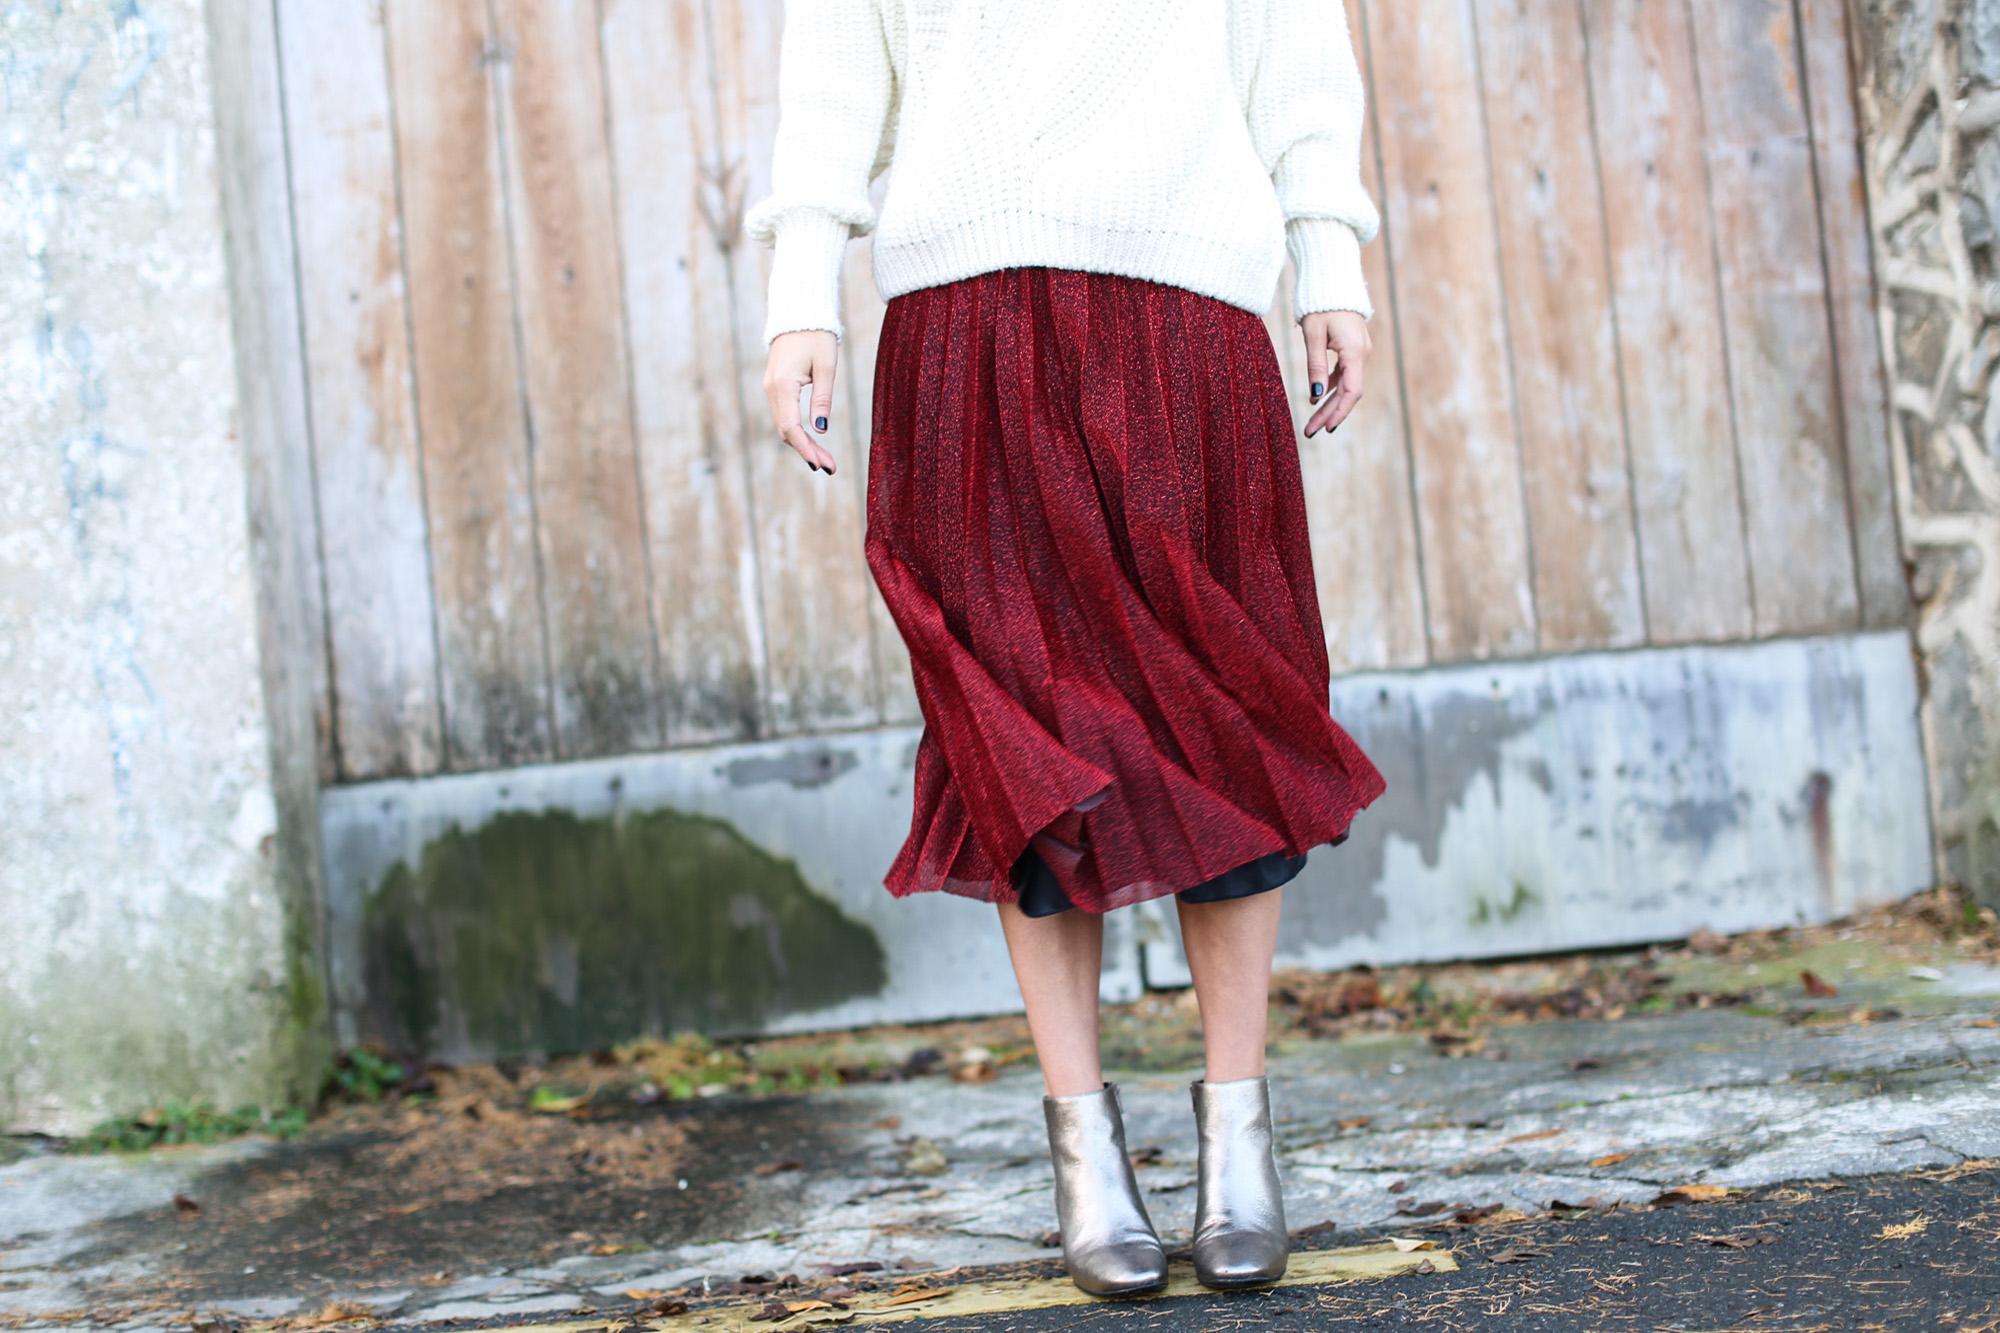 Clochet_streetstyle_fashionblogger_elcorteingles_gloriaortizbotinesbronce_faldaplisadarojaamitie-5